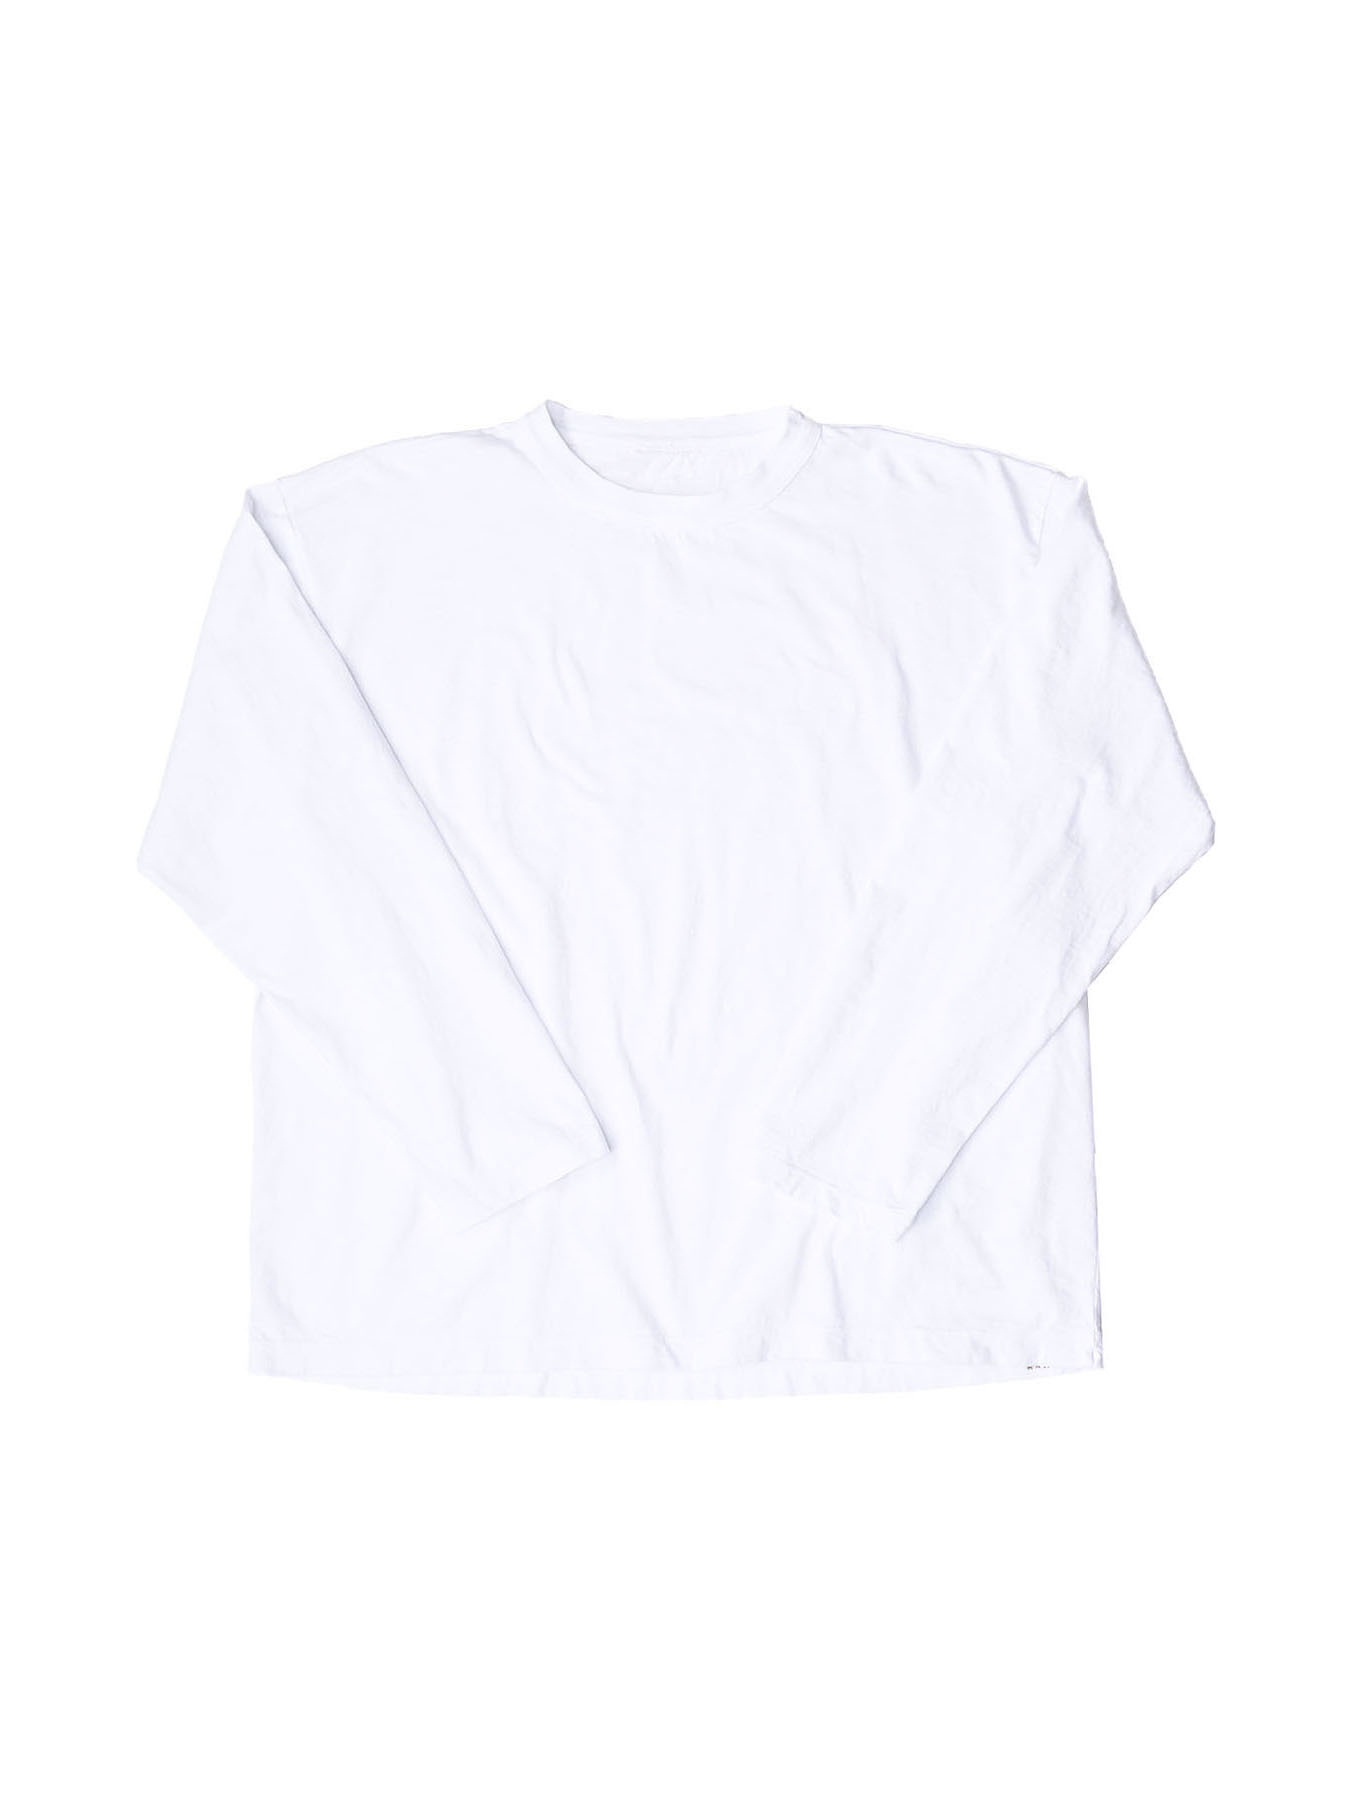 Zimbabwe Cotton Ocean Long-sleeved T-shirt-2